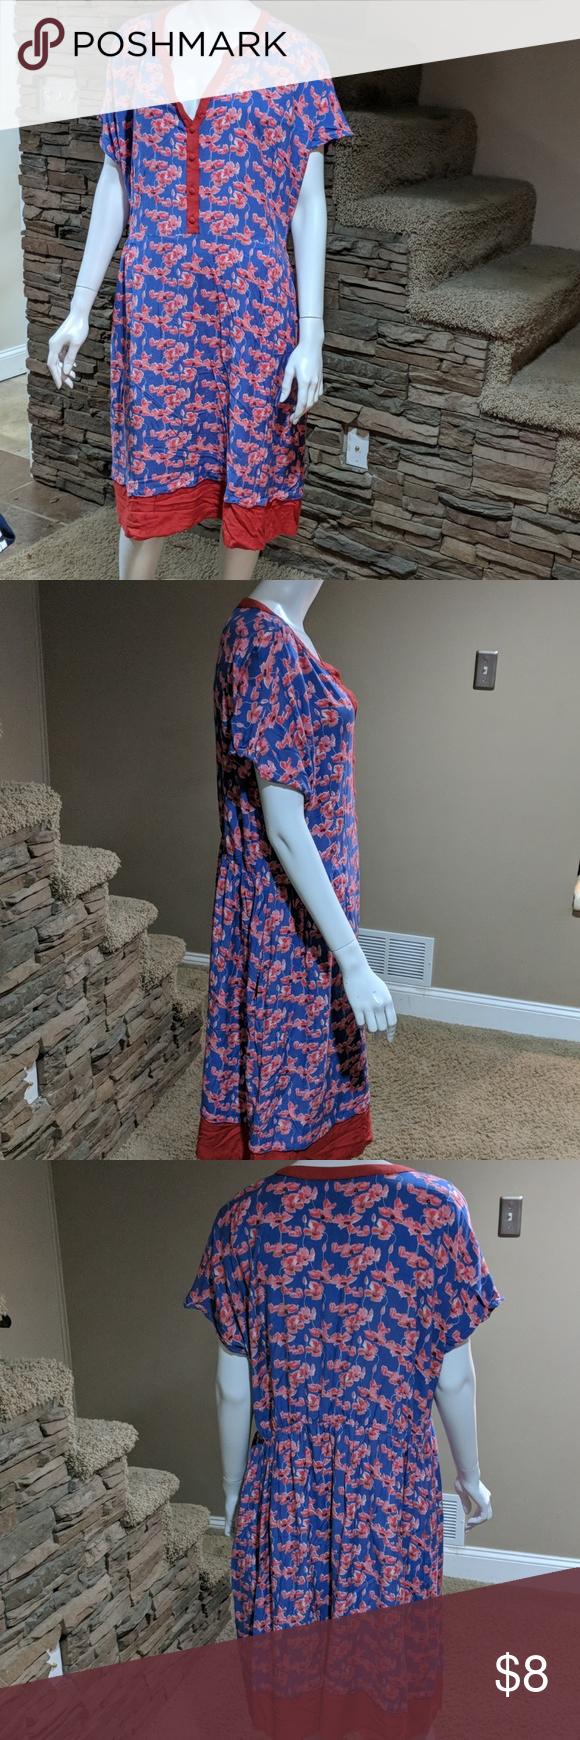 Spring Summer Dress Size 2x Summer Dresses Spring Summer Dress Dresses [ 1740 x 580 Pixel ]